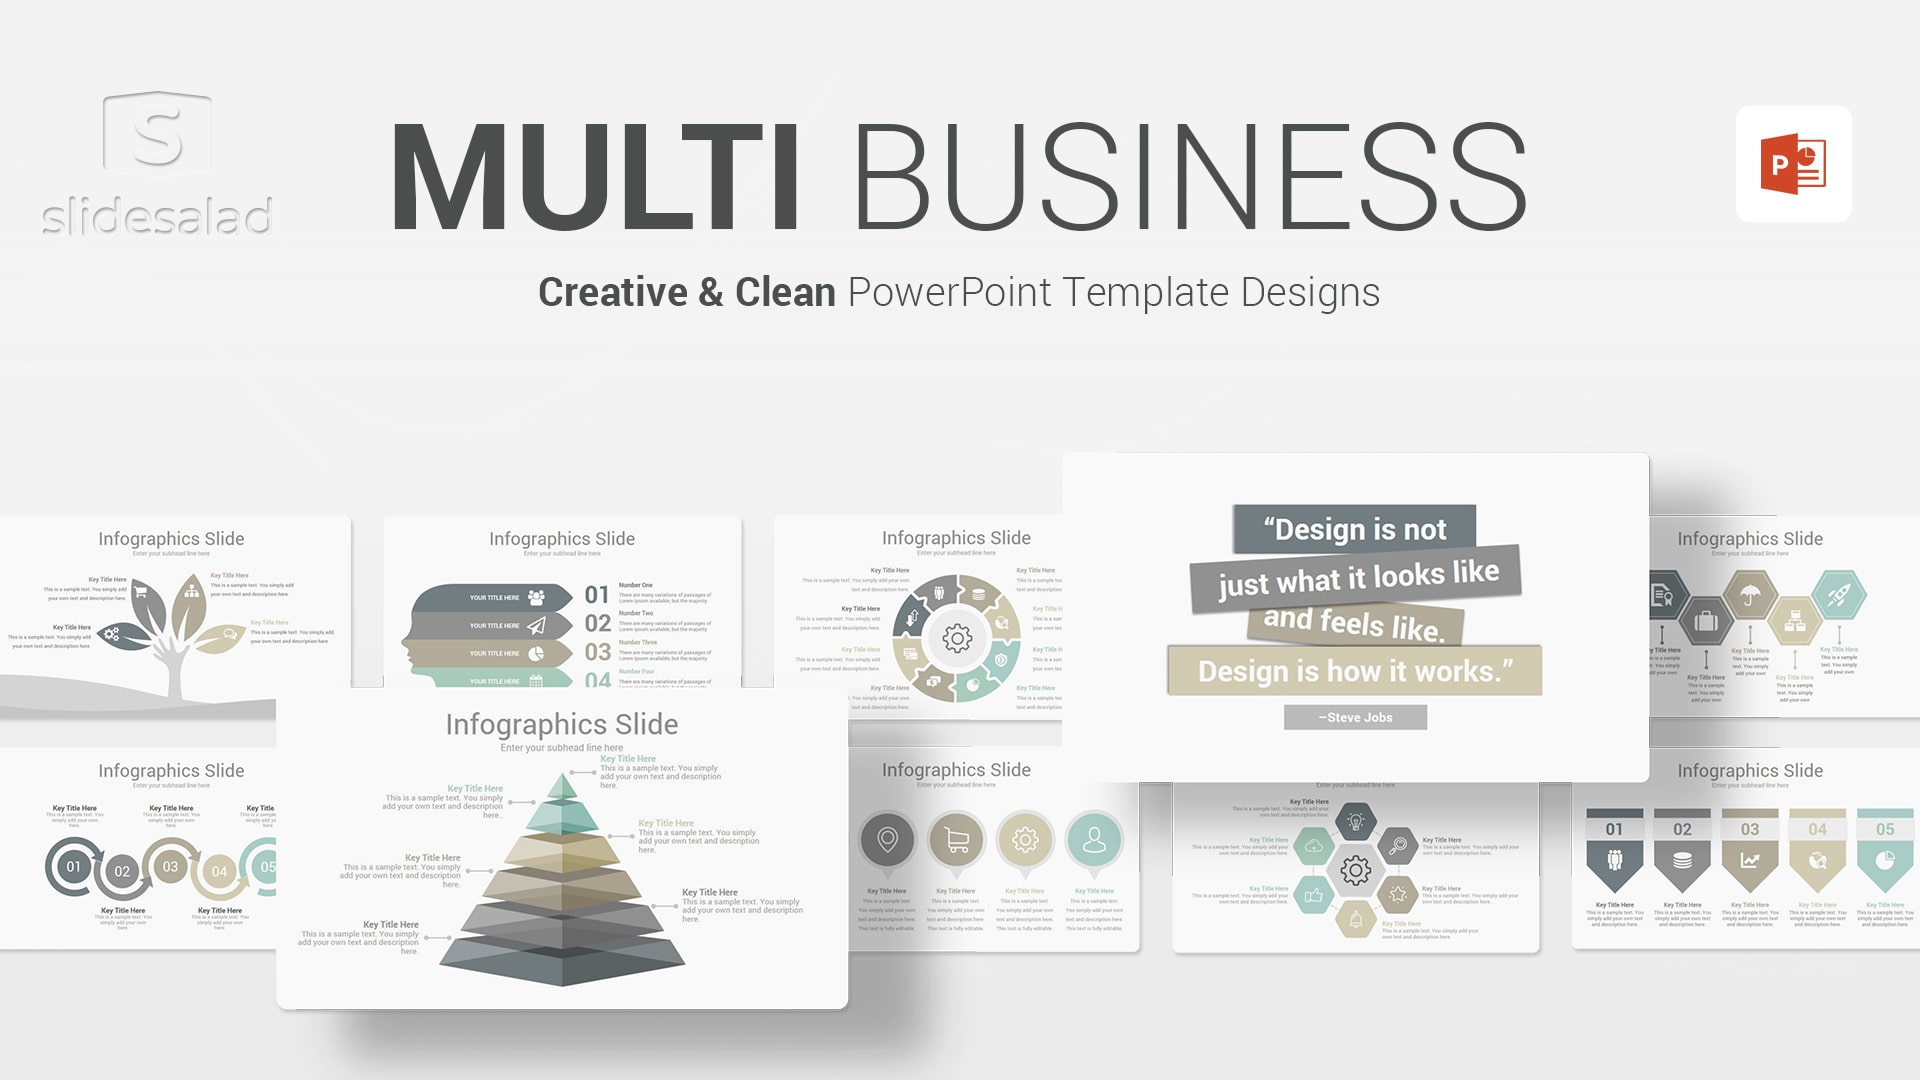 Multi Business PowerPoint Presentation Template - Customizable Multipurpose PPT Design Template